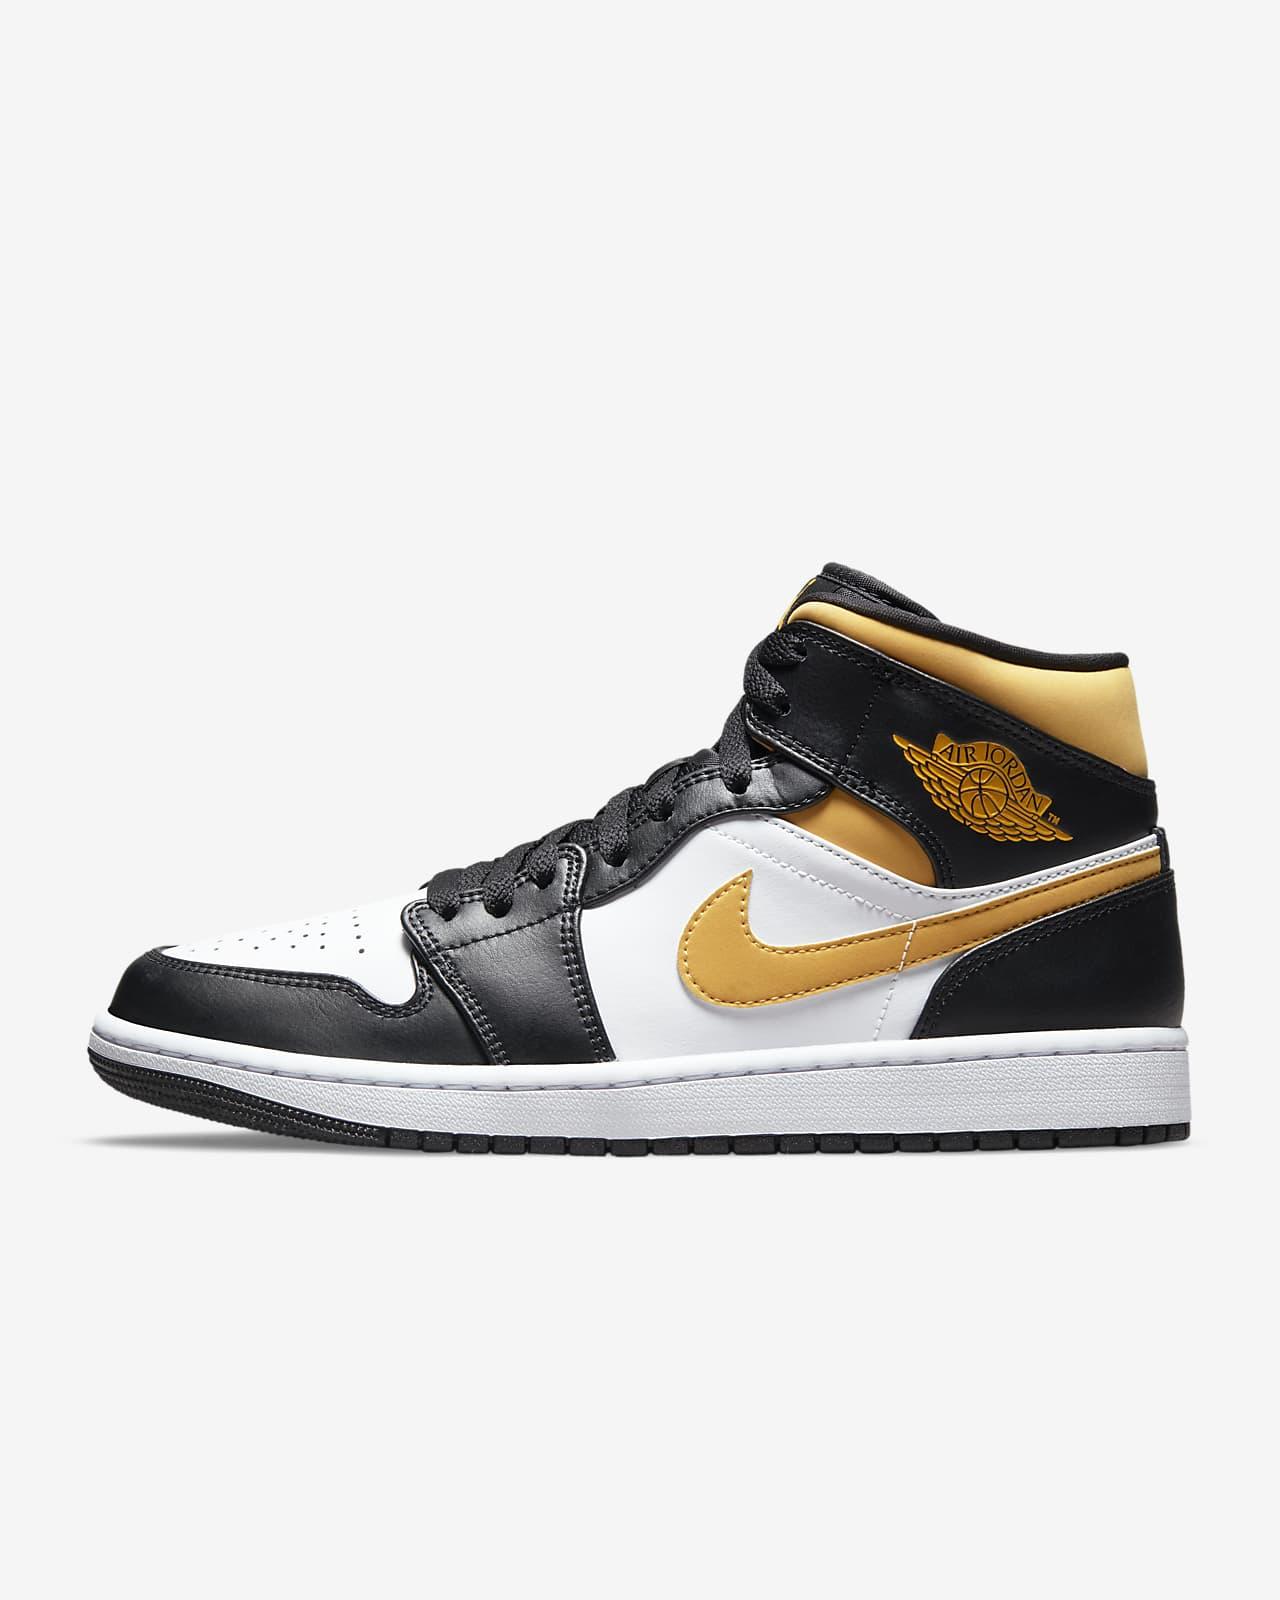 Air Jordan 1 Mid Shoes